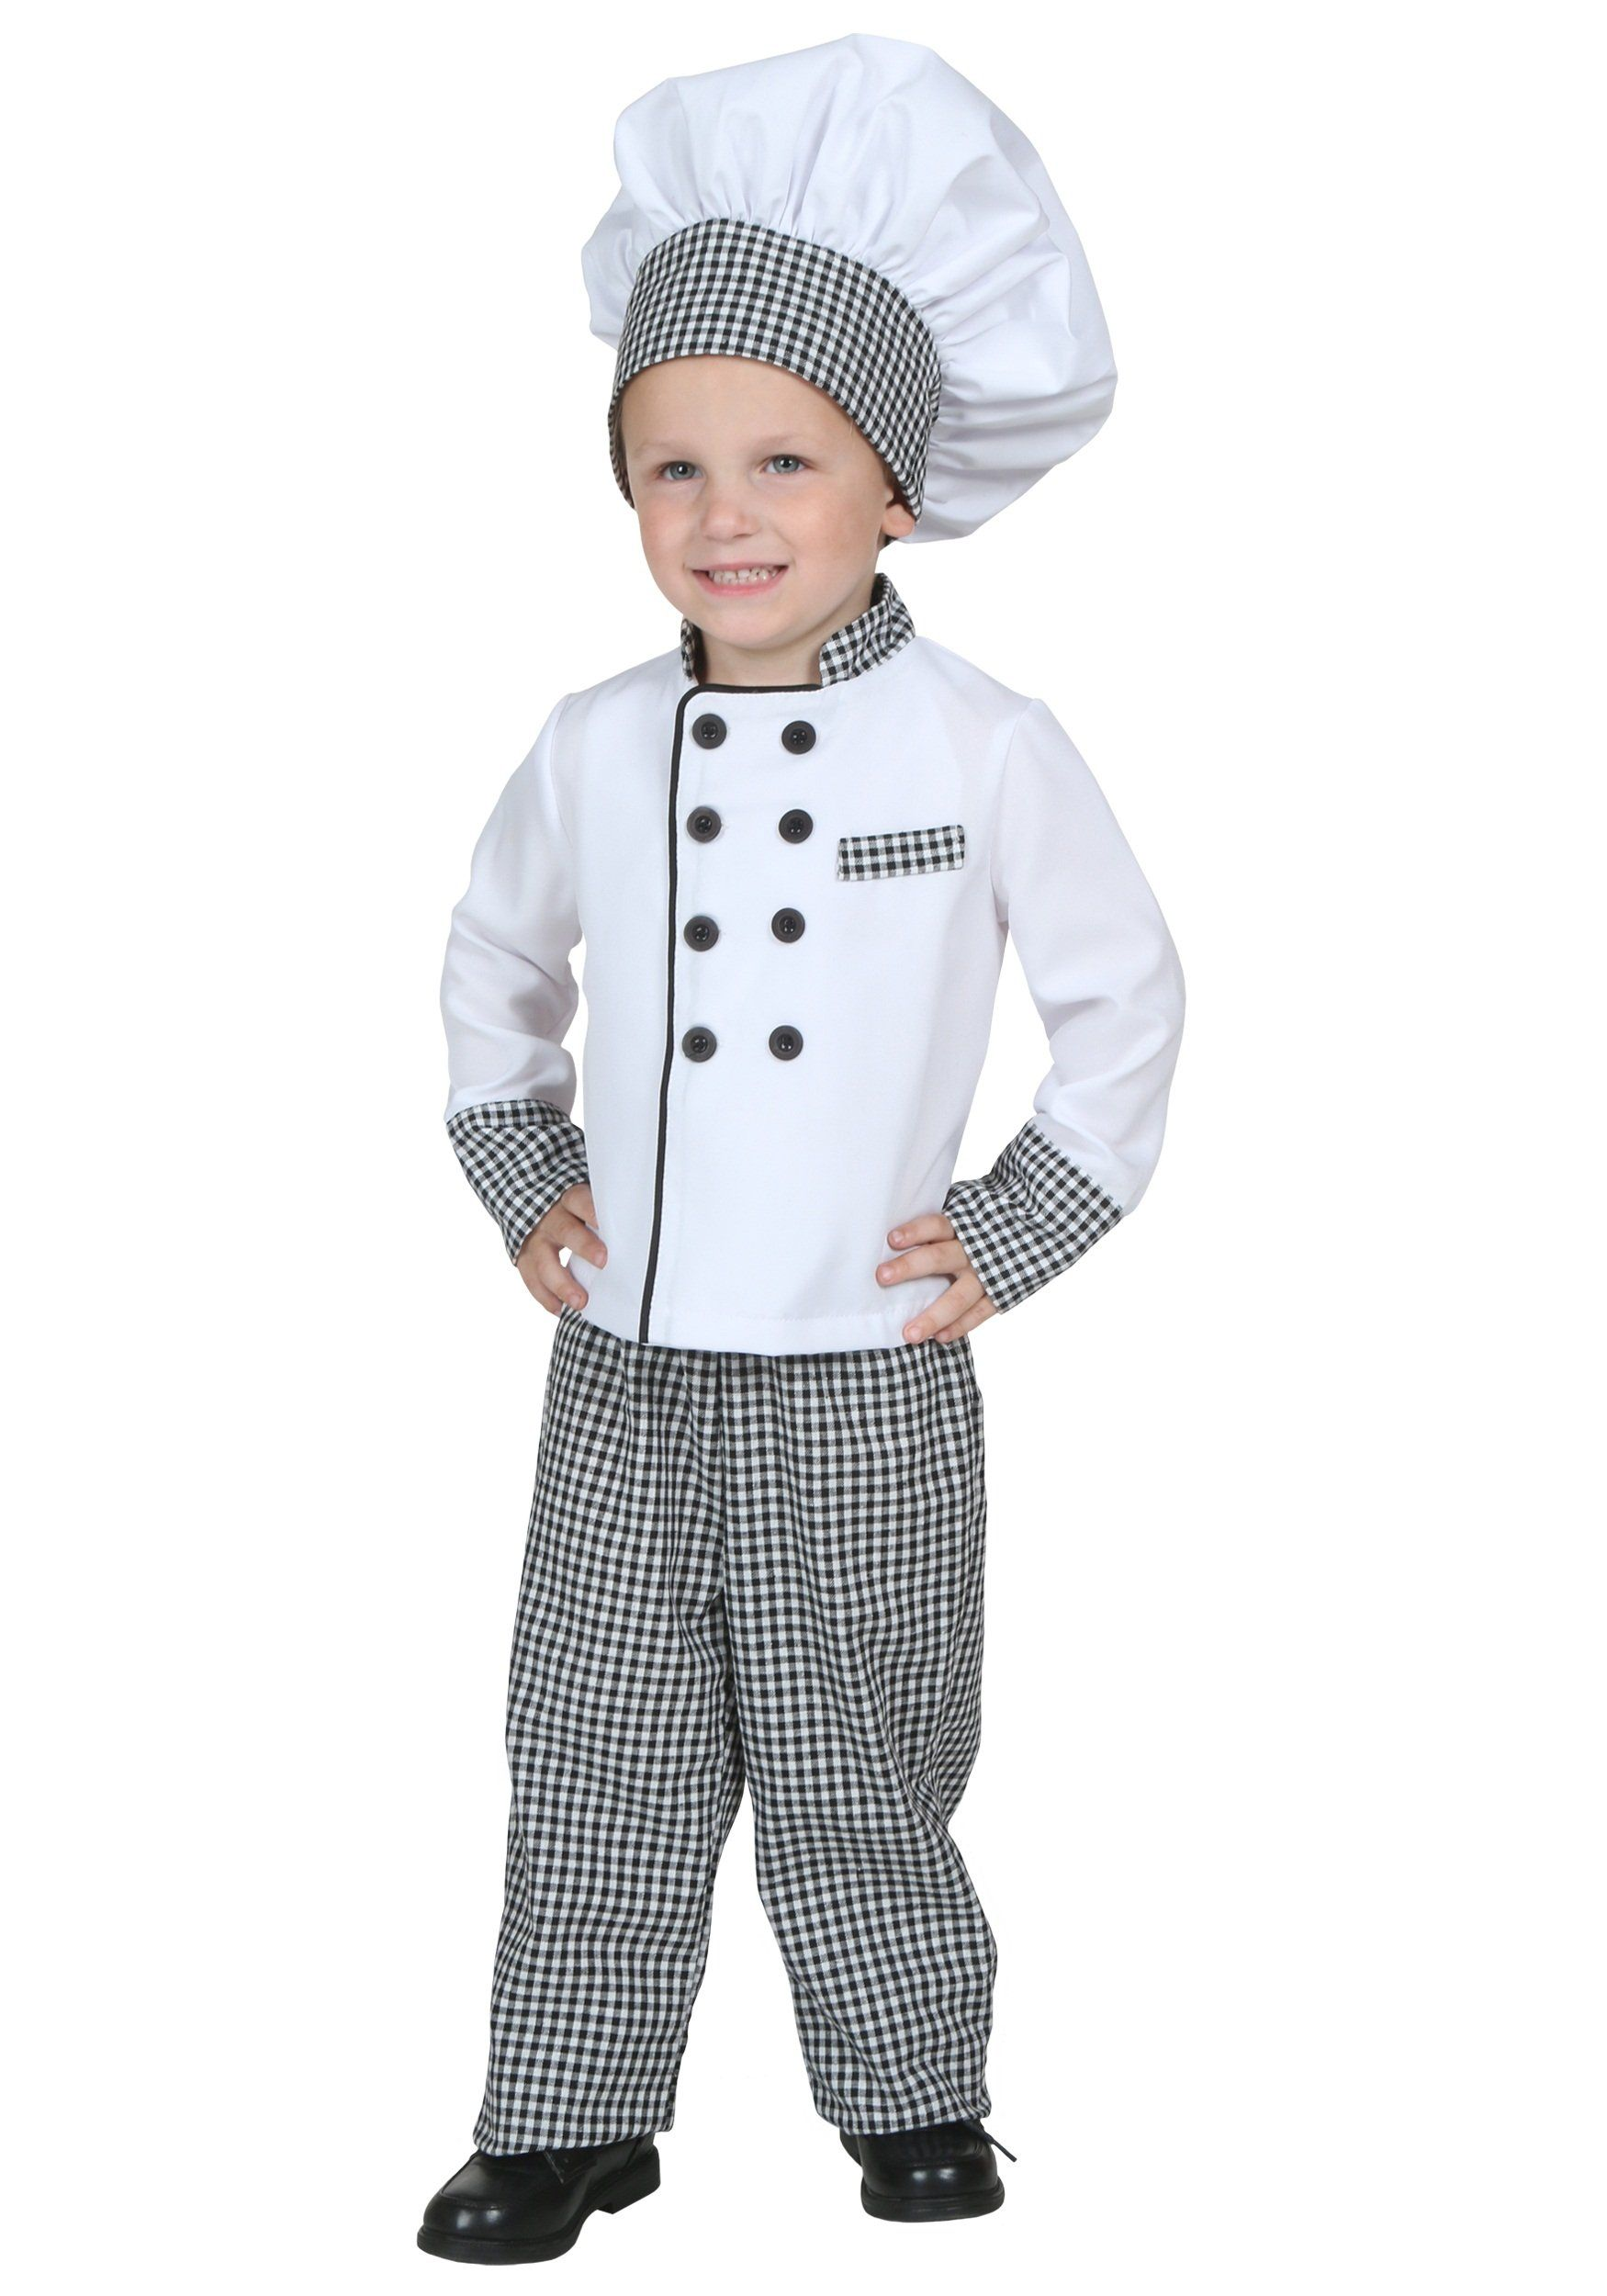 Toddler Chef Costume 4T Chef costume, Kids chef